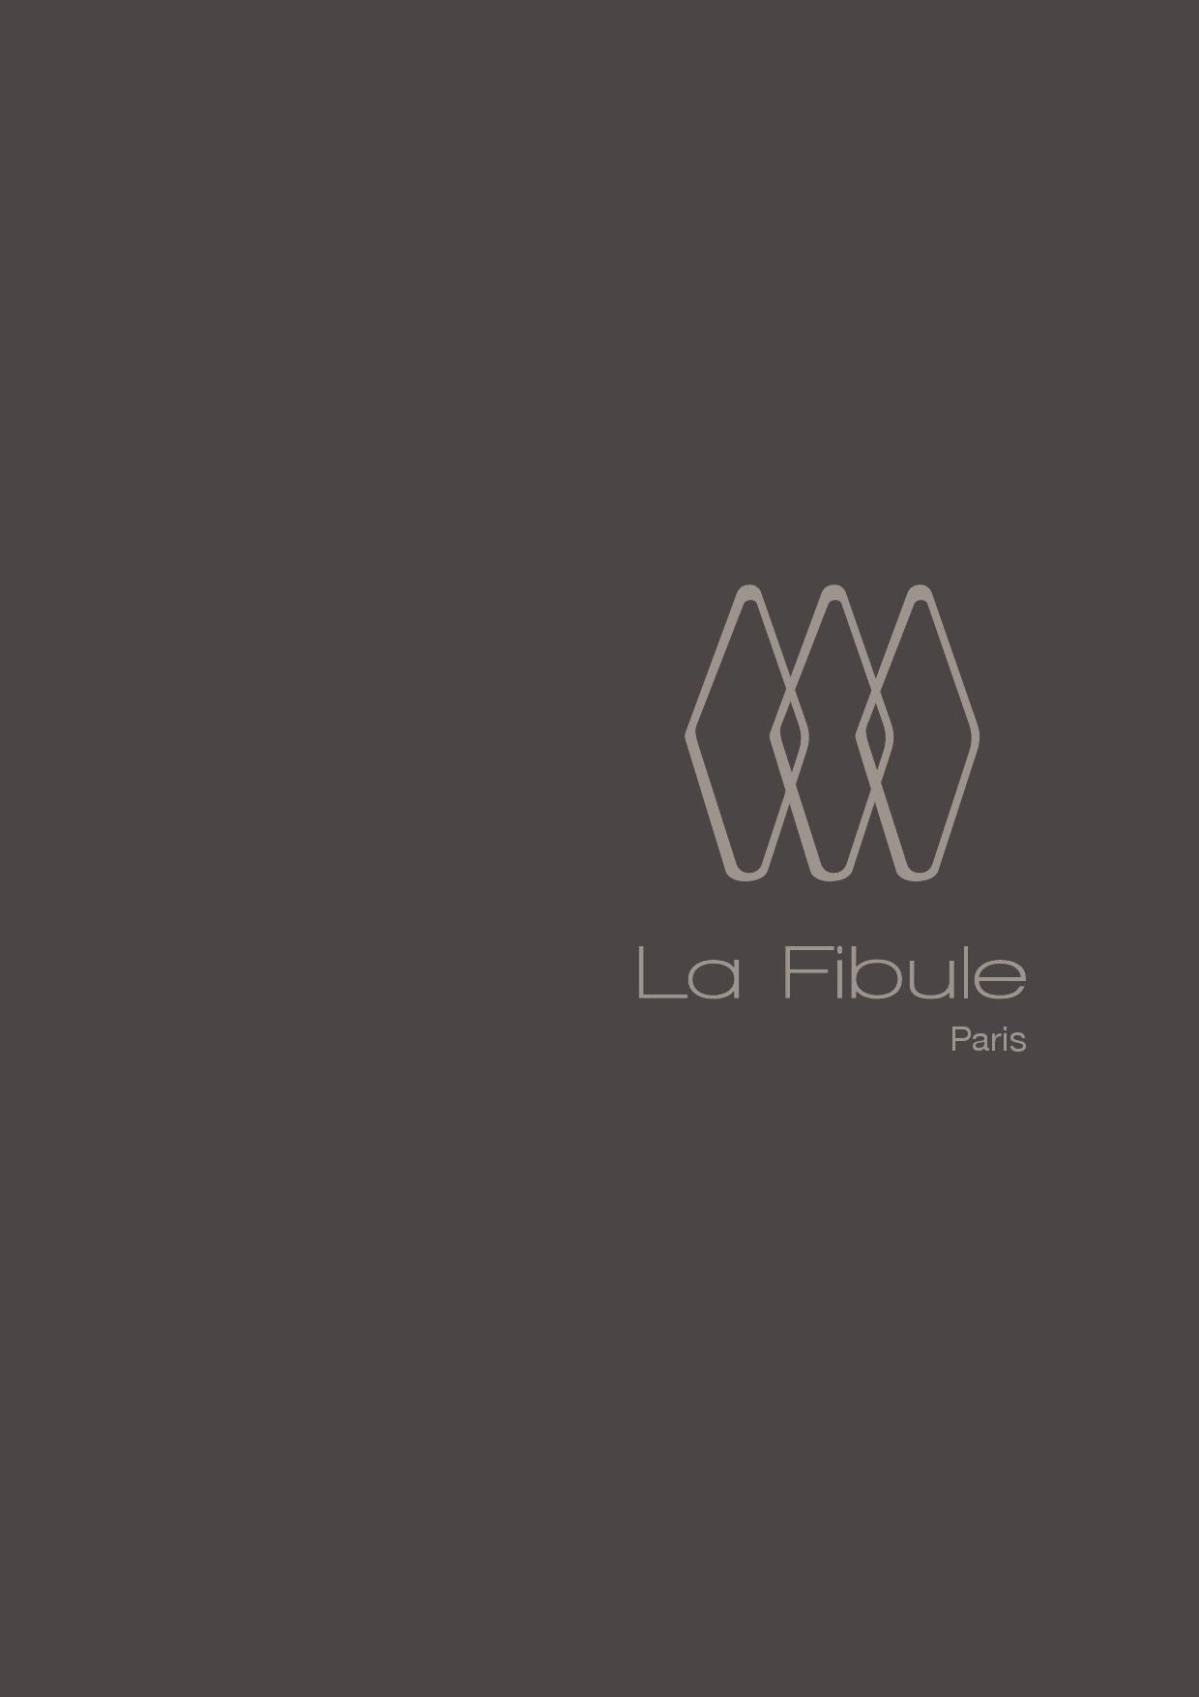 Catalogue-La-Fibule-2019_000001